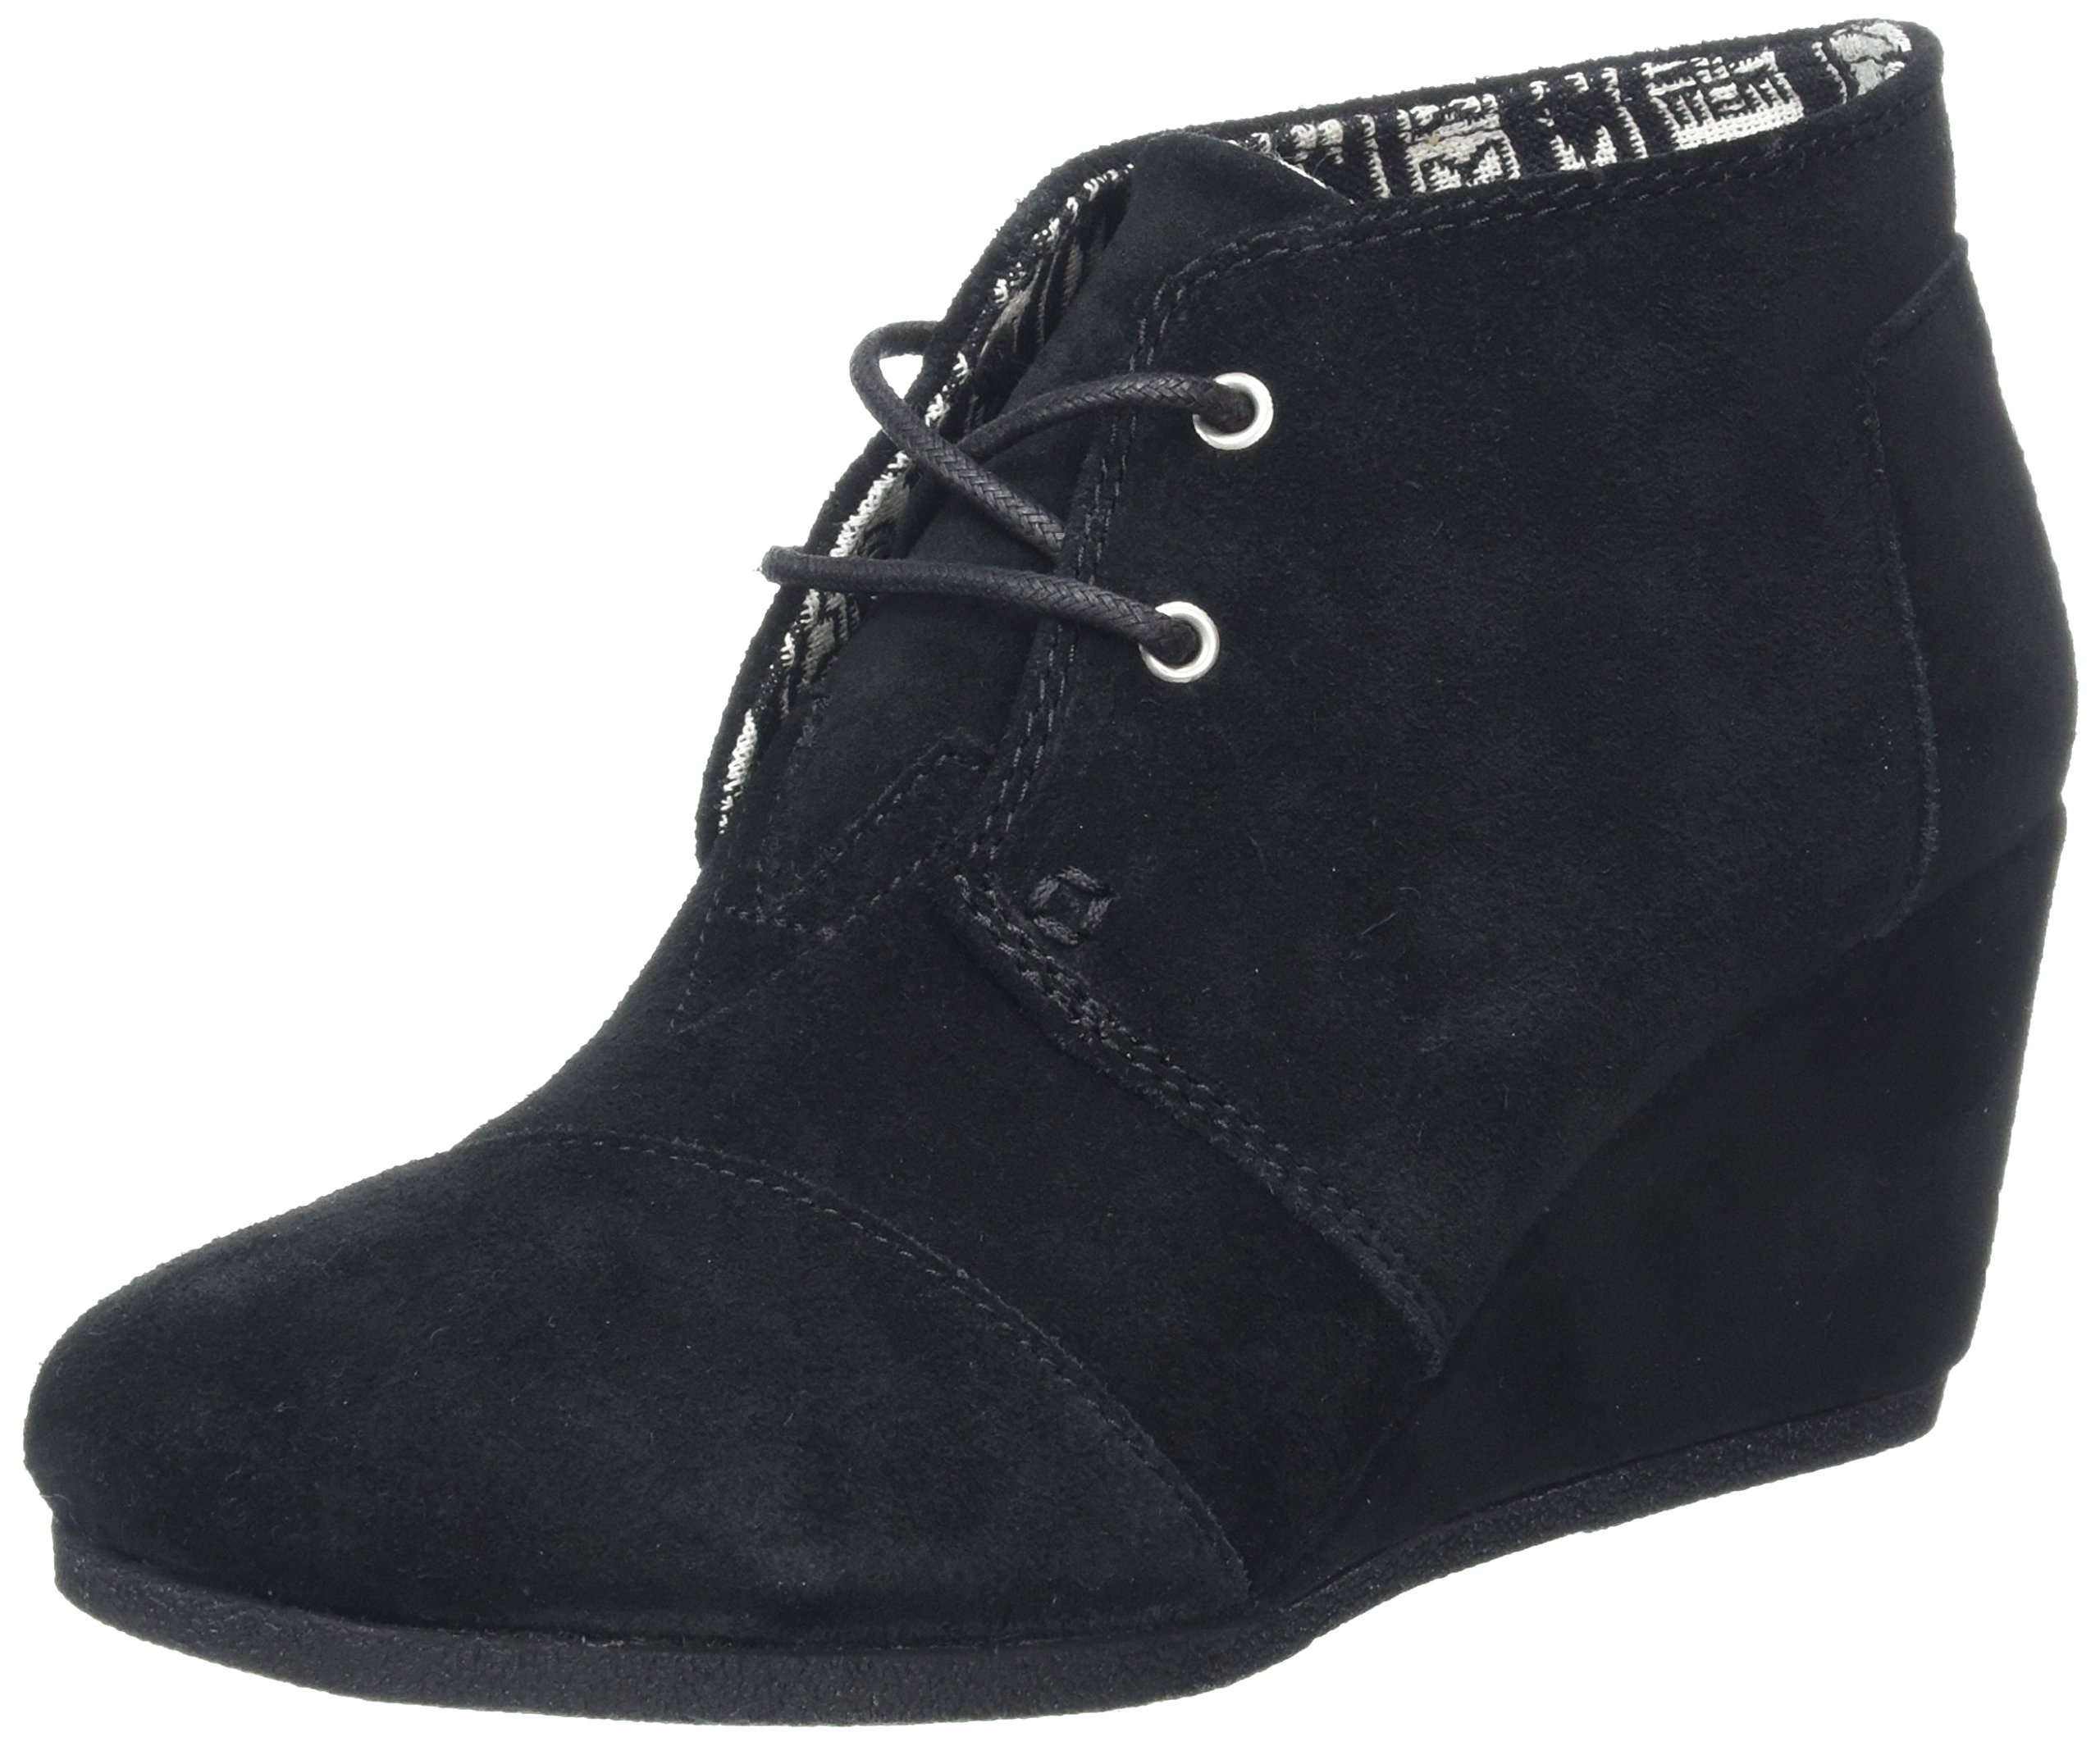 Black Wedges Shoe: Amazon.com